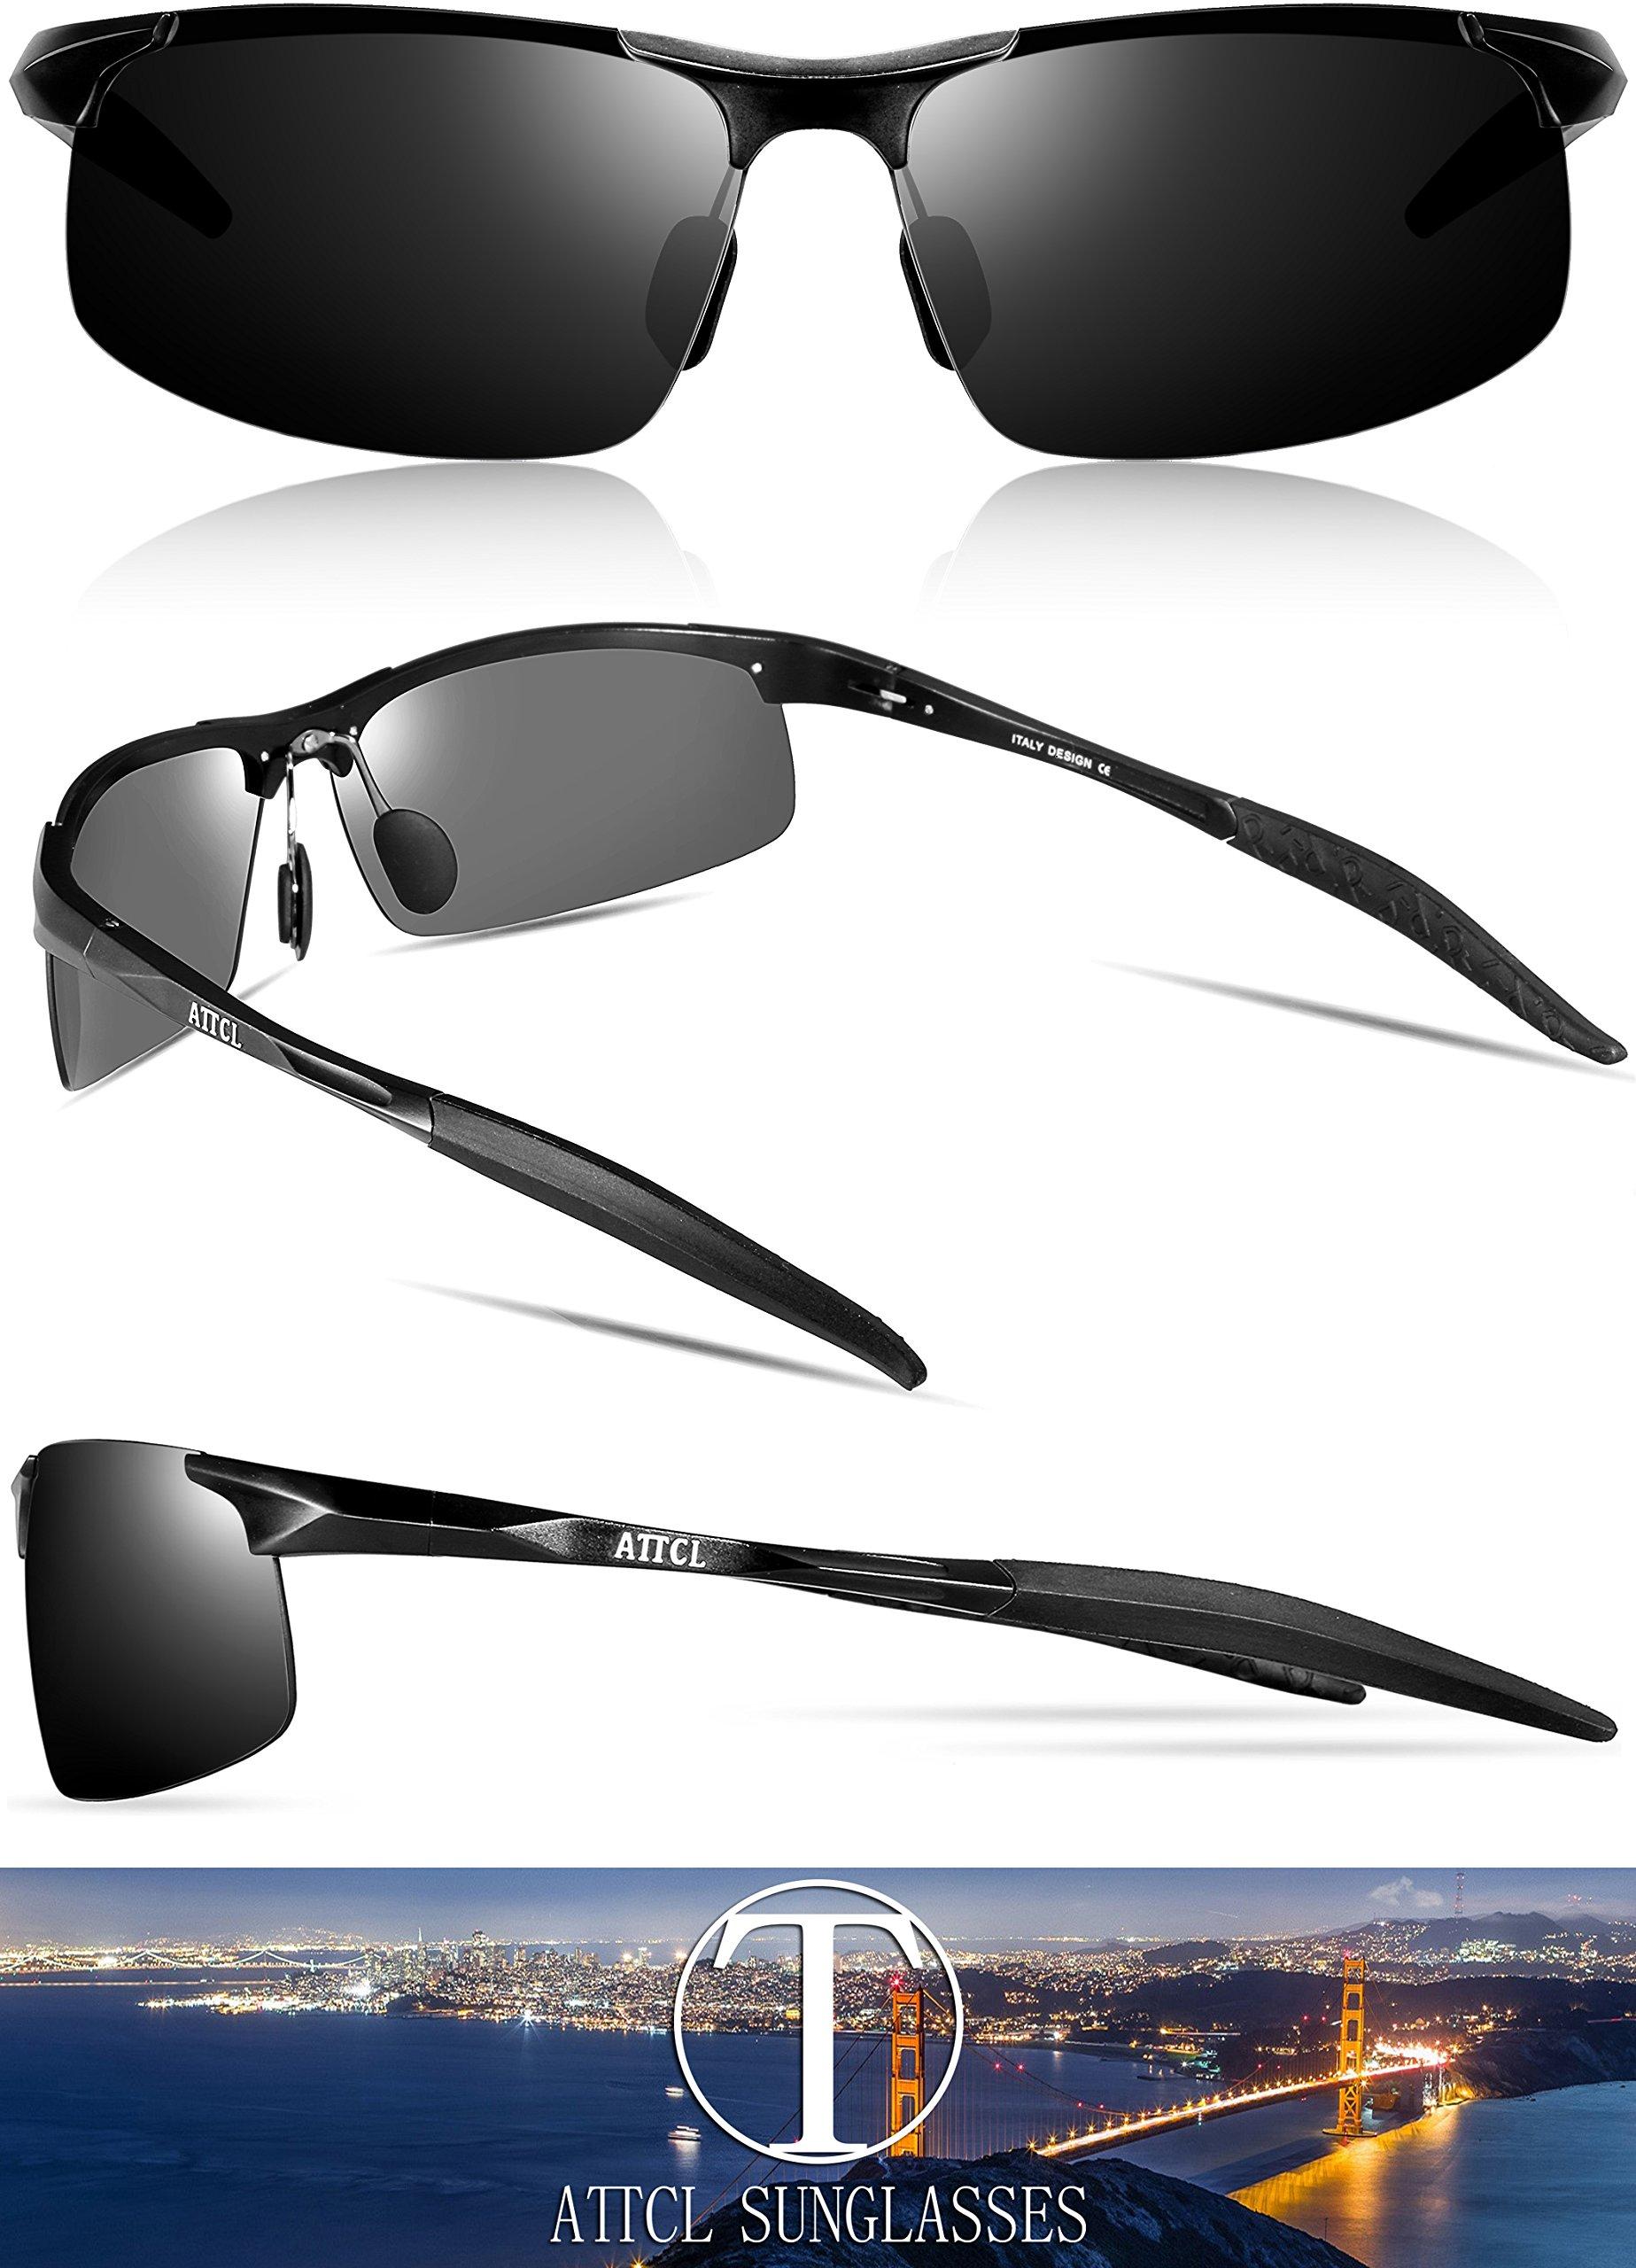 a7a274028f ATTCL Mens Fashion Driving Polarized Sunglasses Man Al-Mg Metal ...